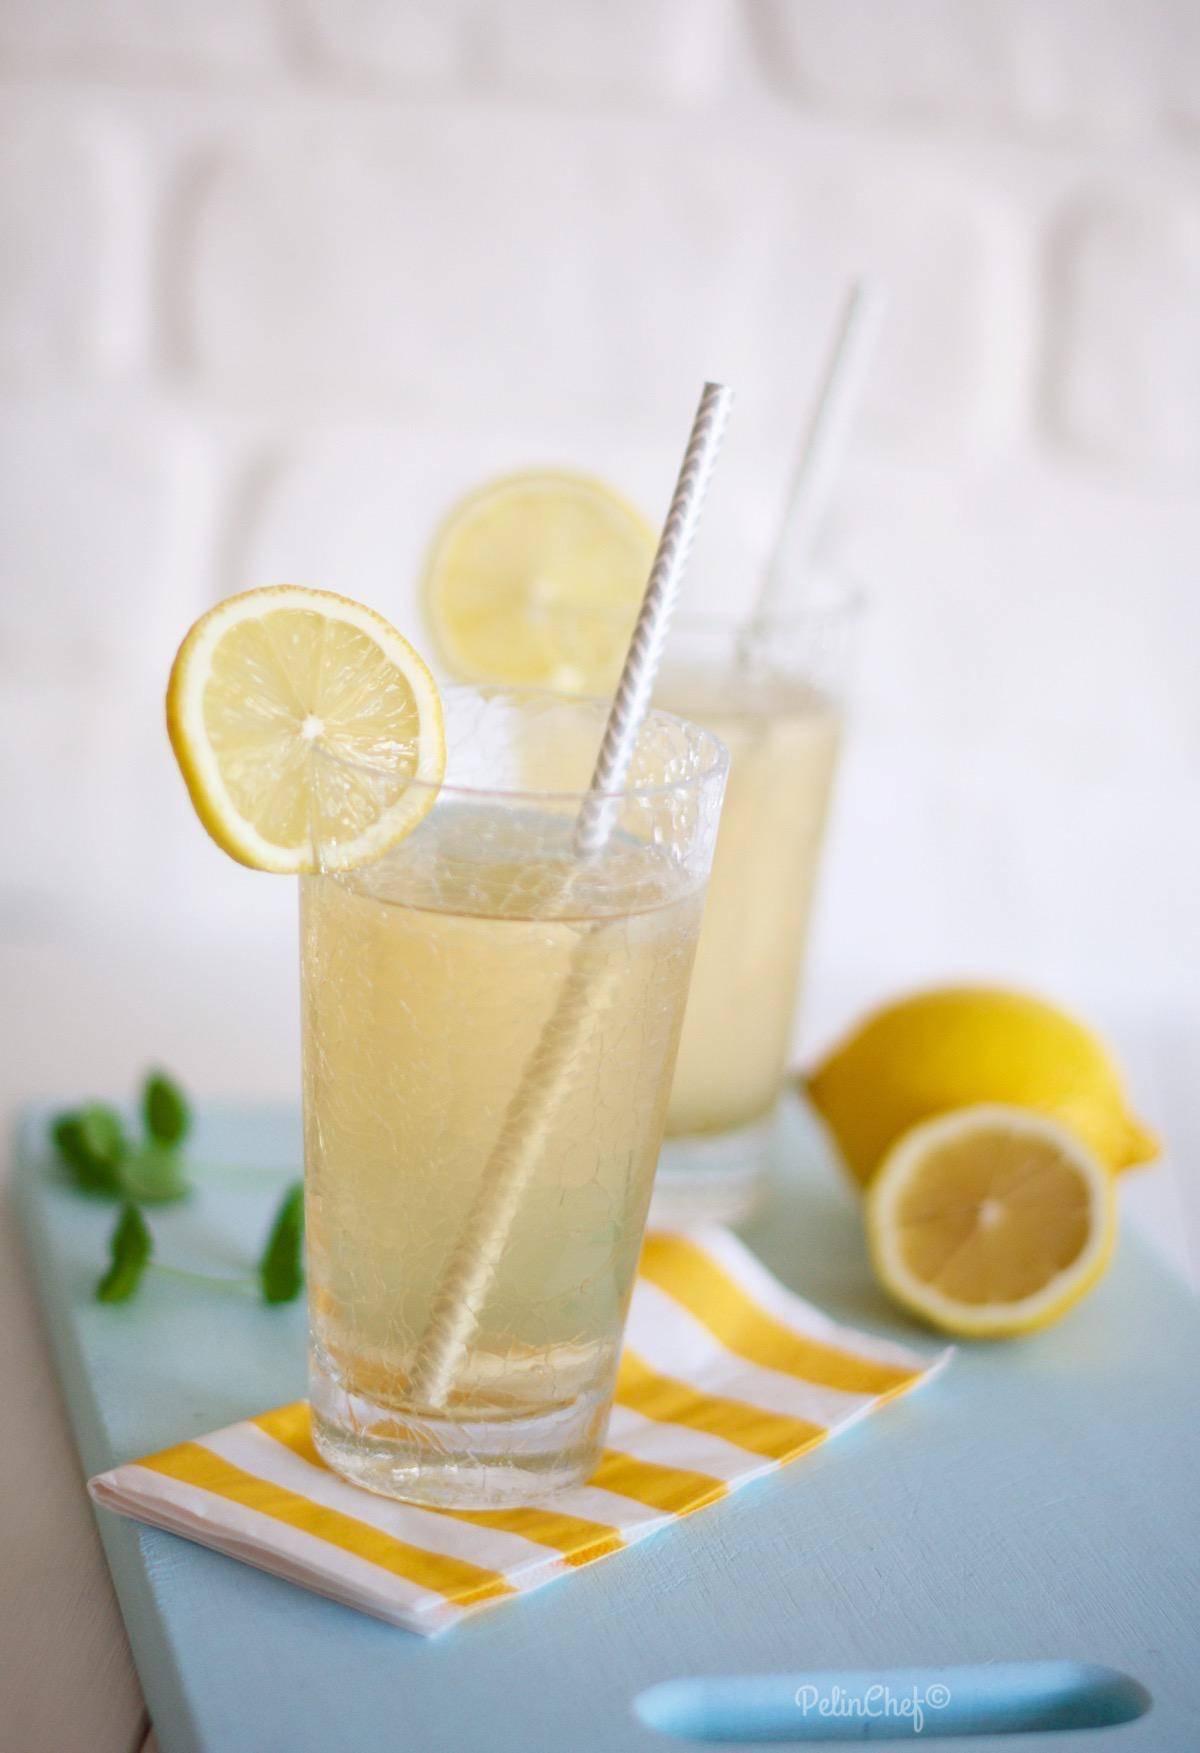 limonlu buzlu yeşil çay1